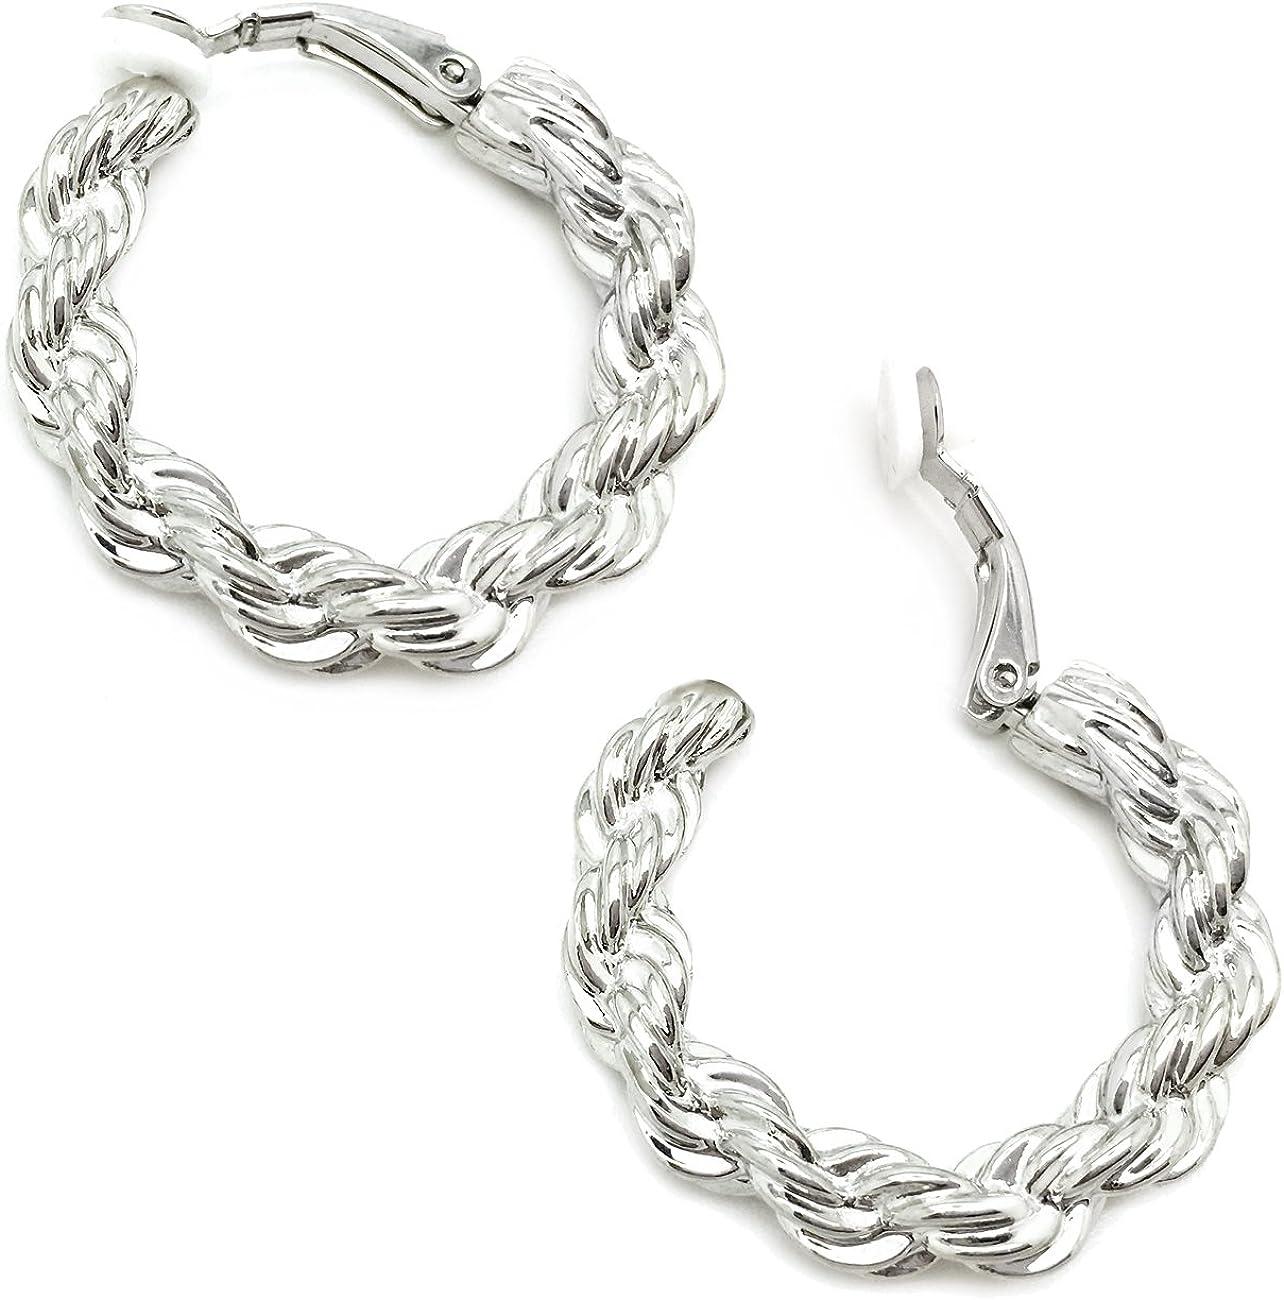 25mm Design Circle Hoop Earrings  Wedding  Jewelry Making  Rhodium Plated Brass  2pcs  ke150